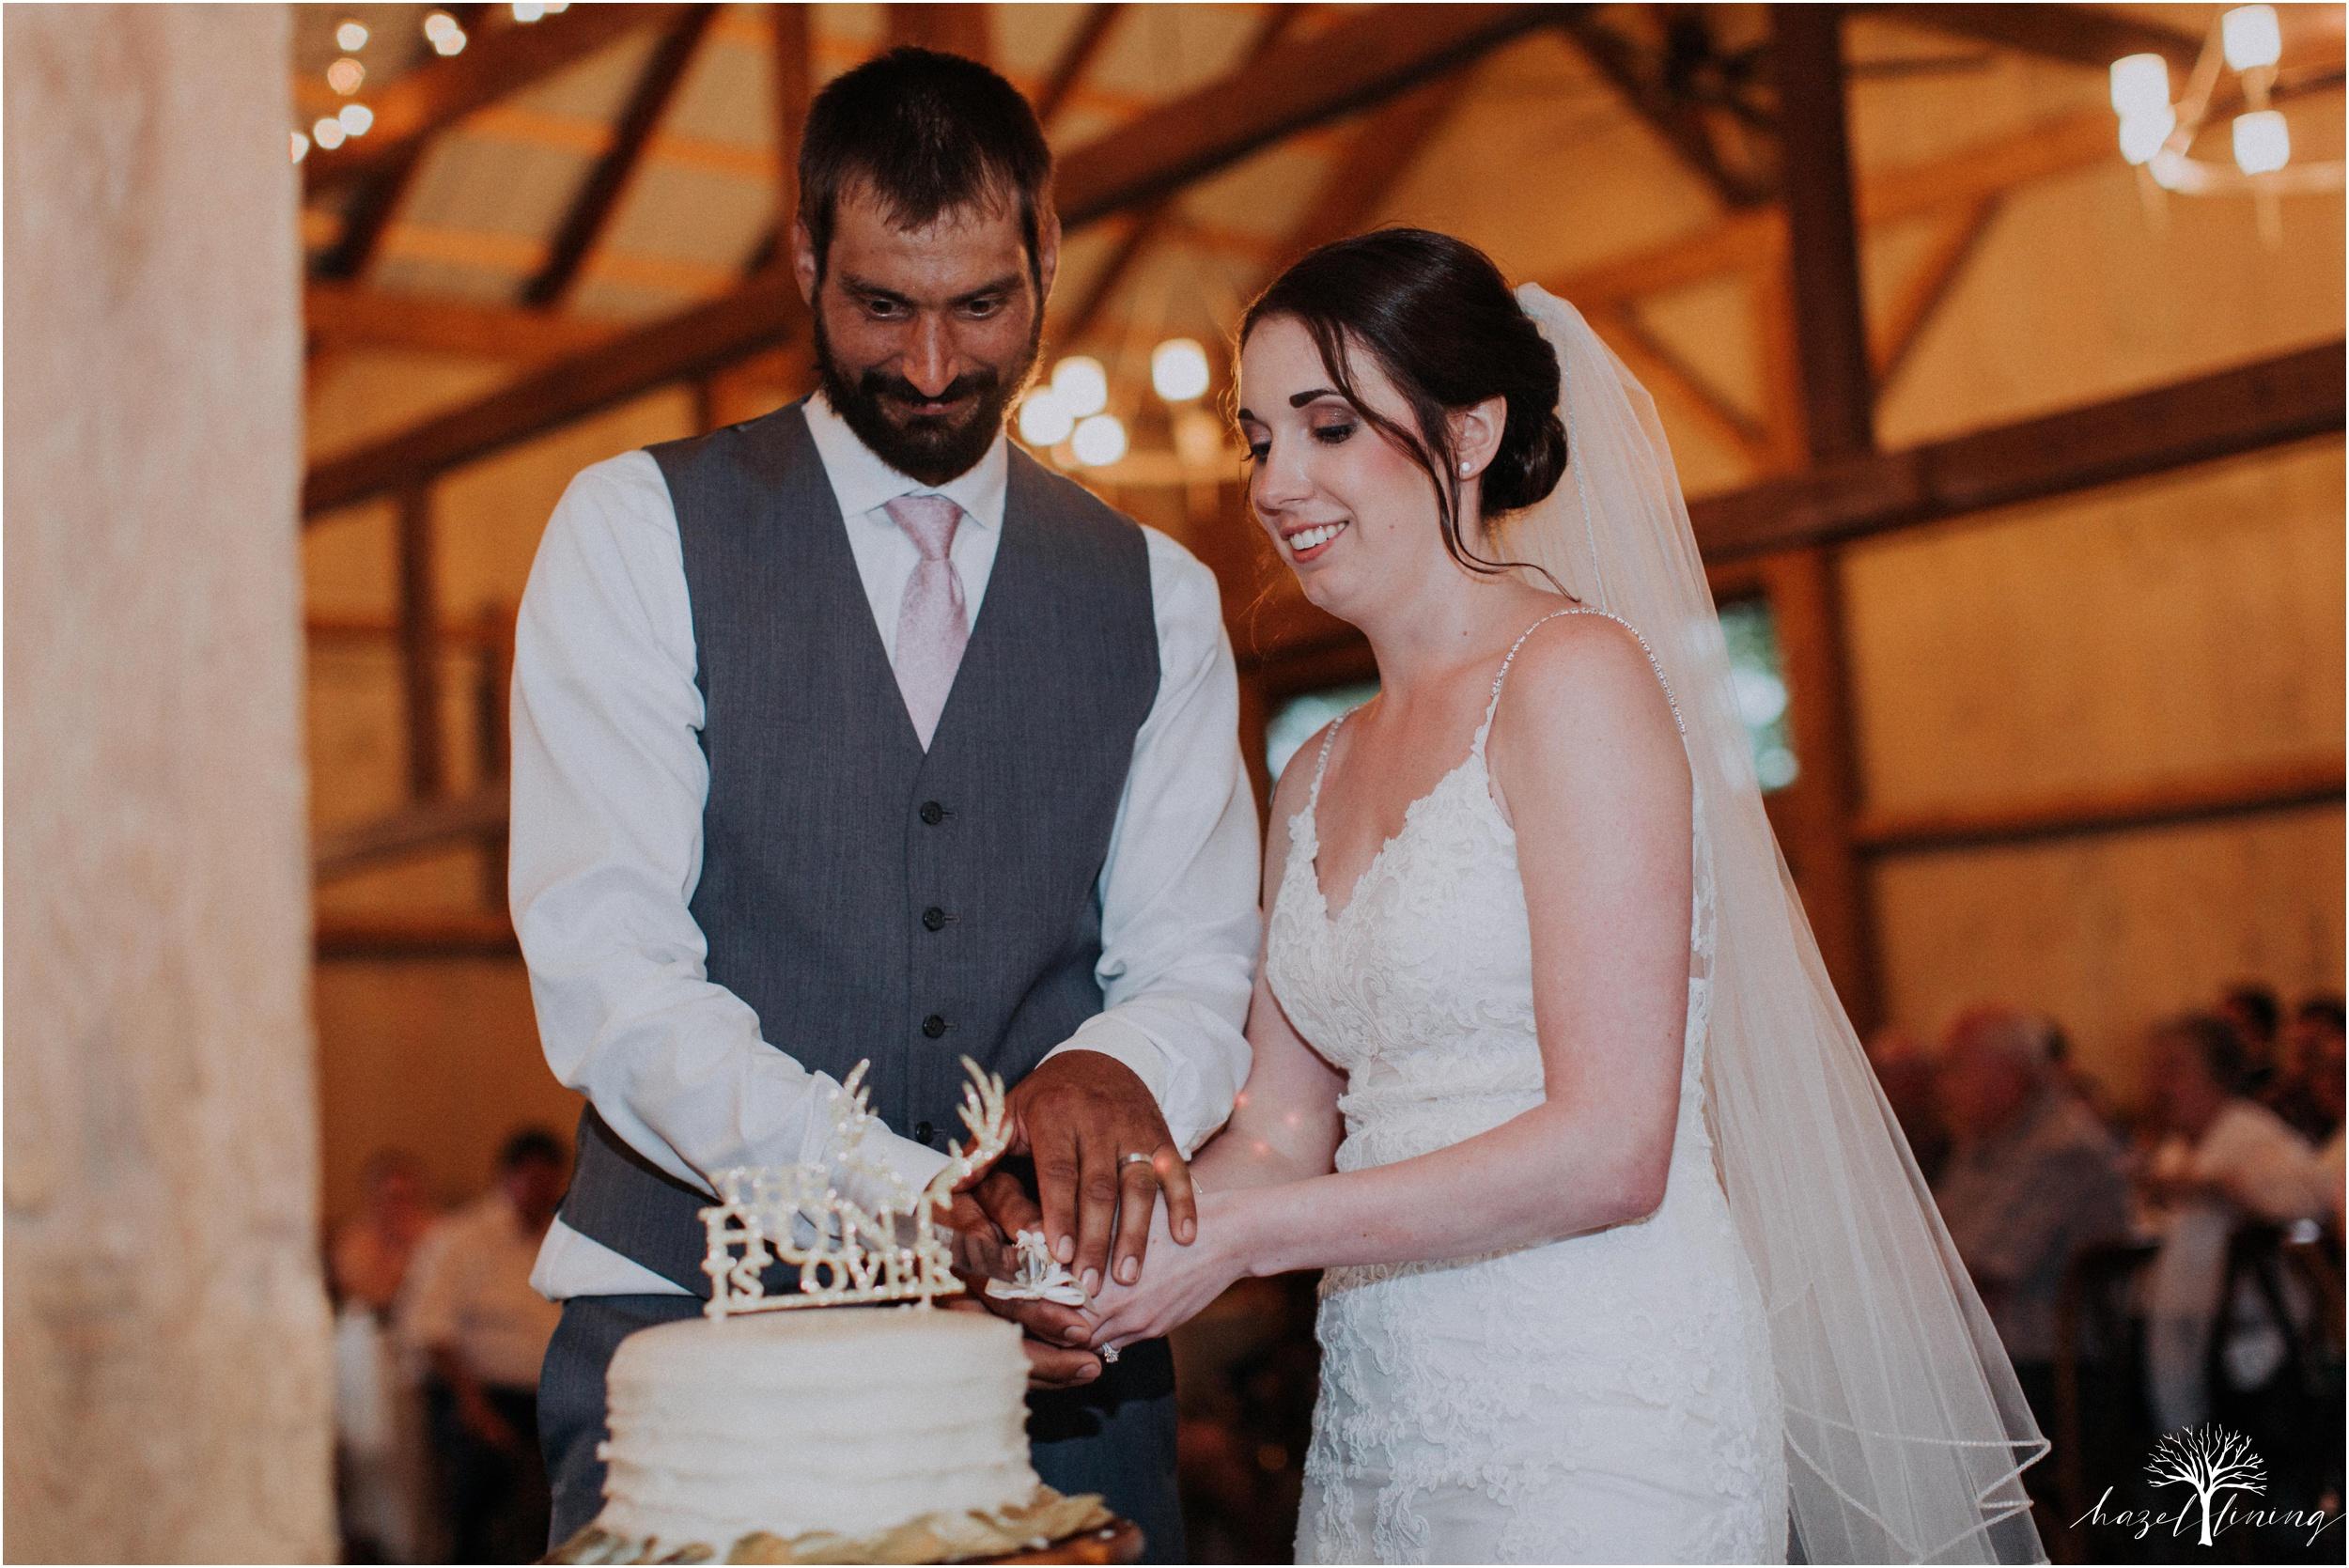 hazel-lining-travel-wedding-elopement-photography-lisa-landon-shoemaker-the-farm-bakery-and-events-bucks-county-quakertown-pennsylvania-summer-country-outdoor-farm-wedding_0141.jpg